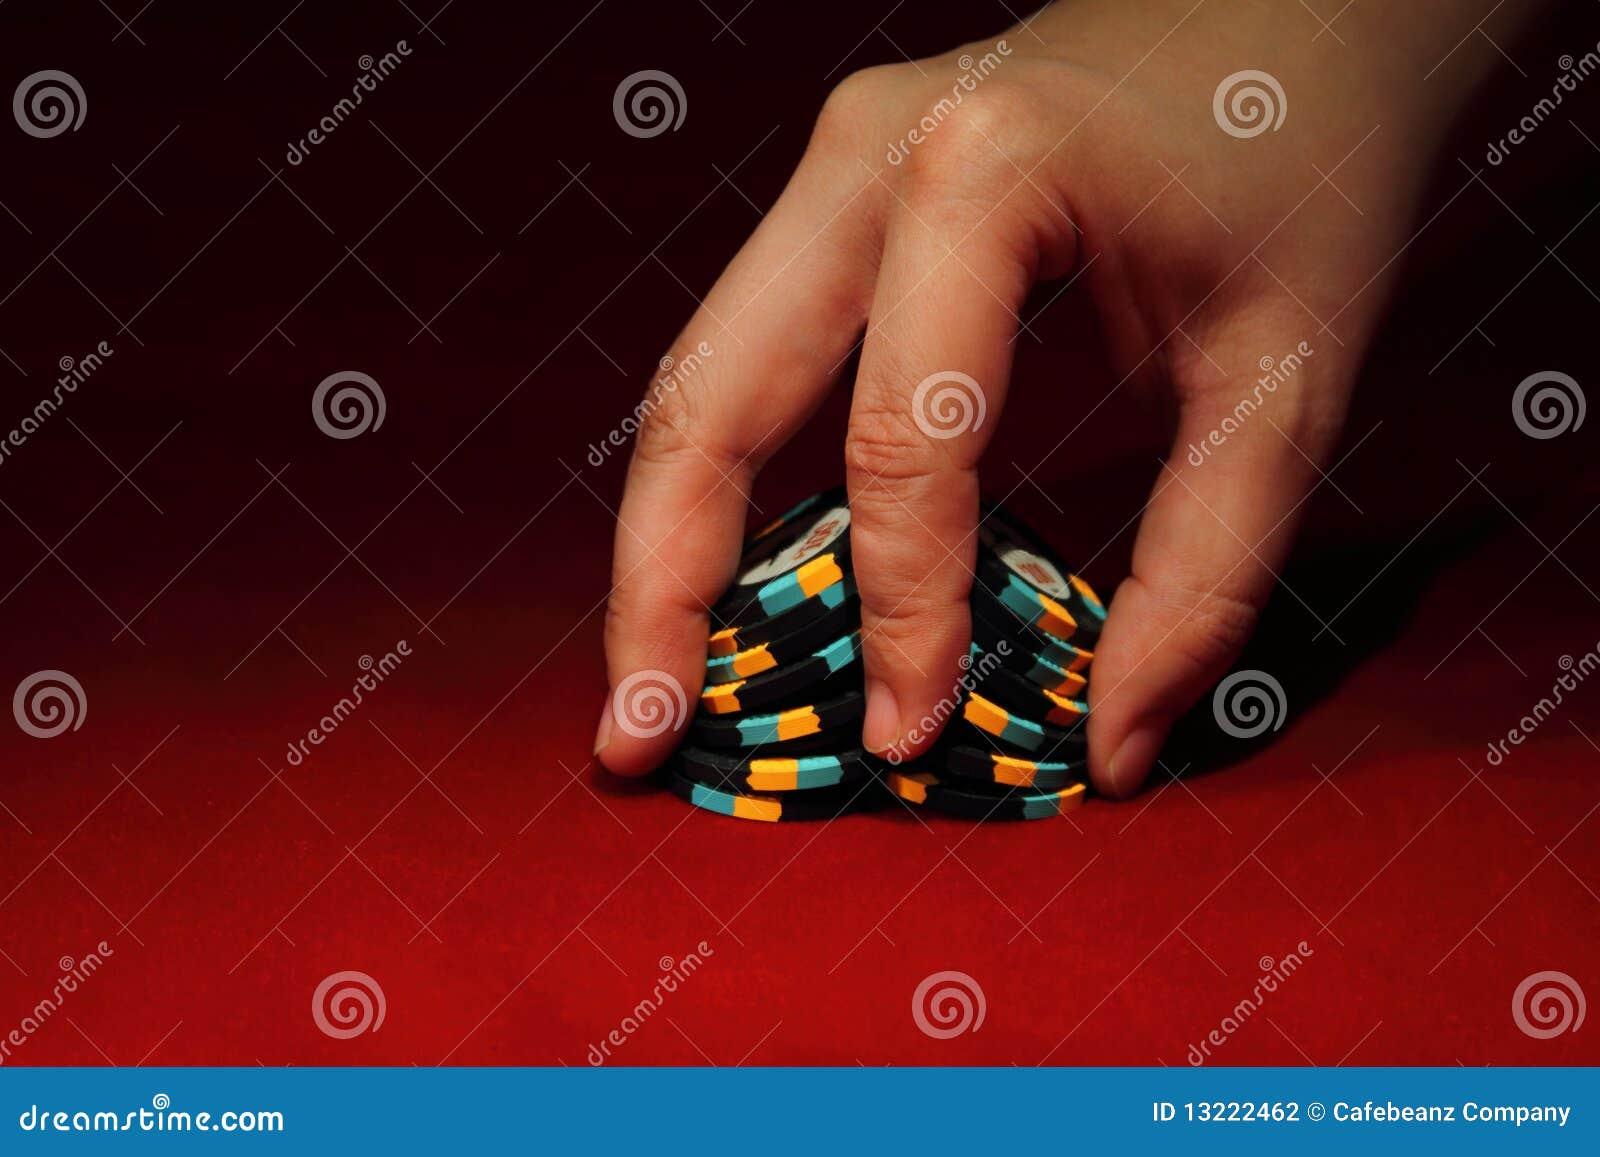 gambling traduction fr